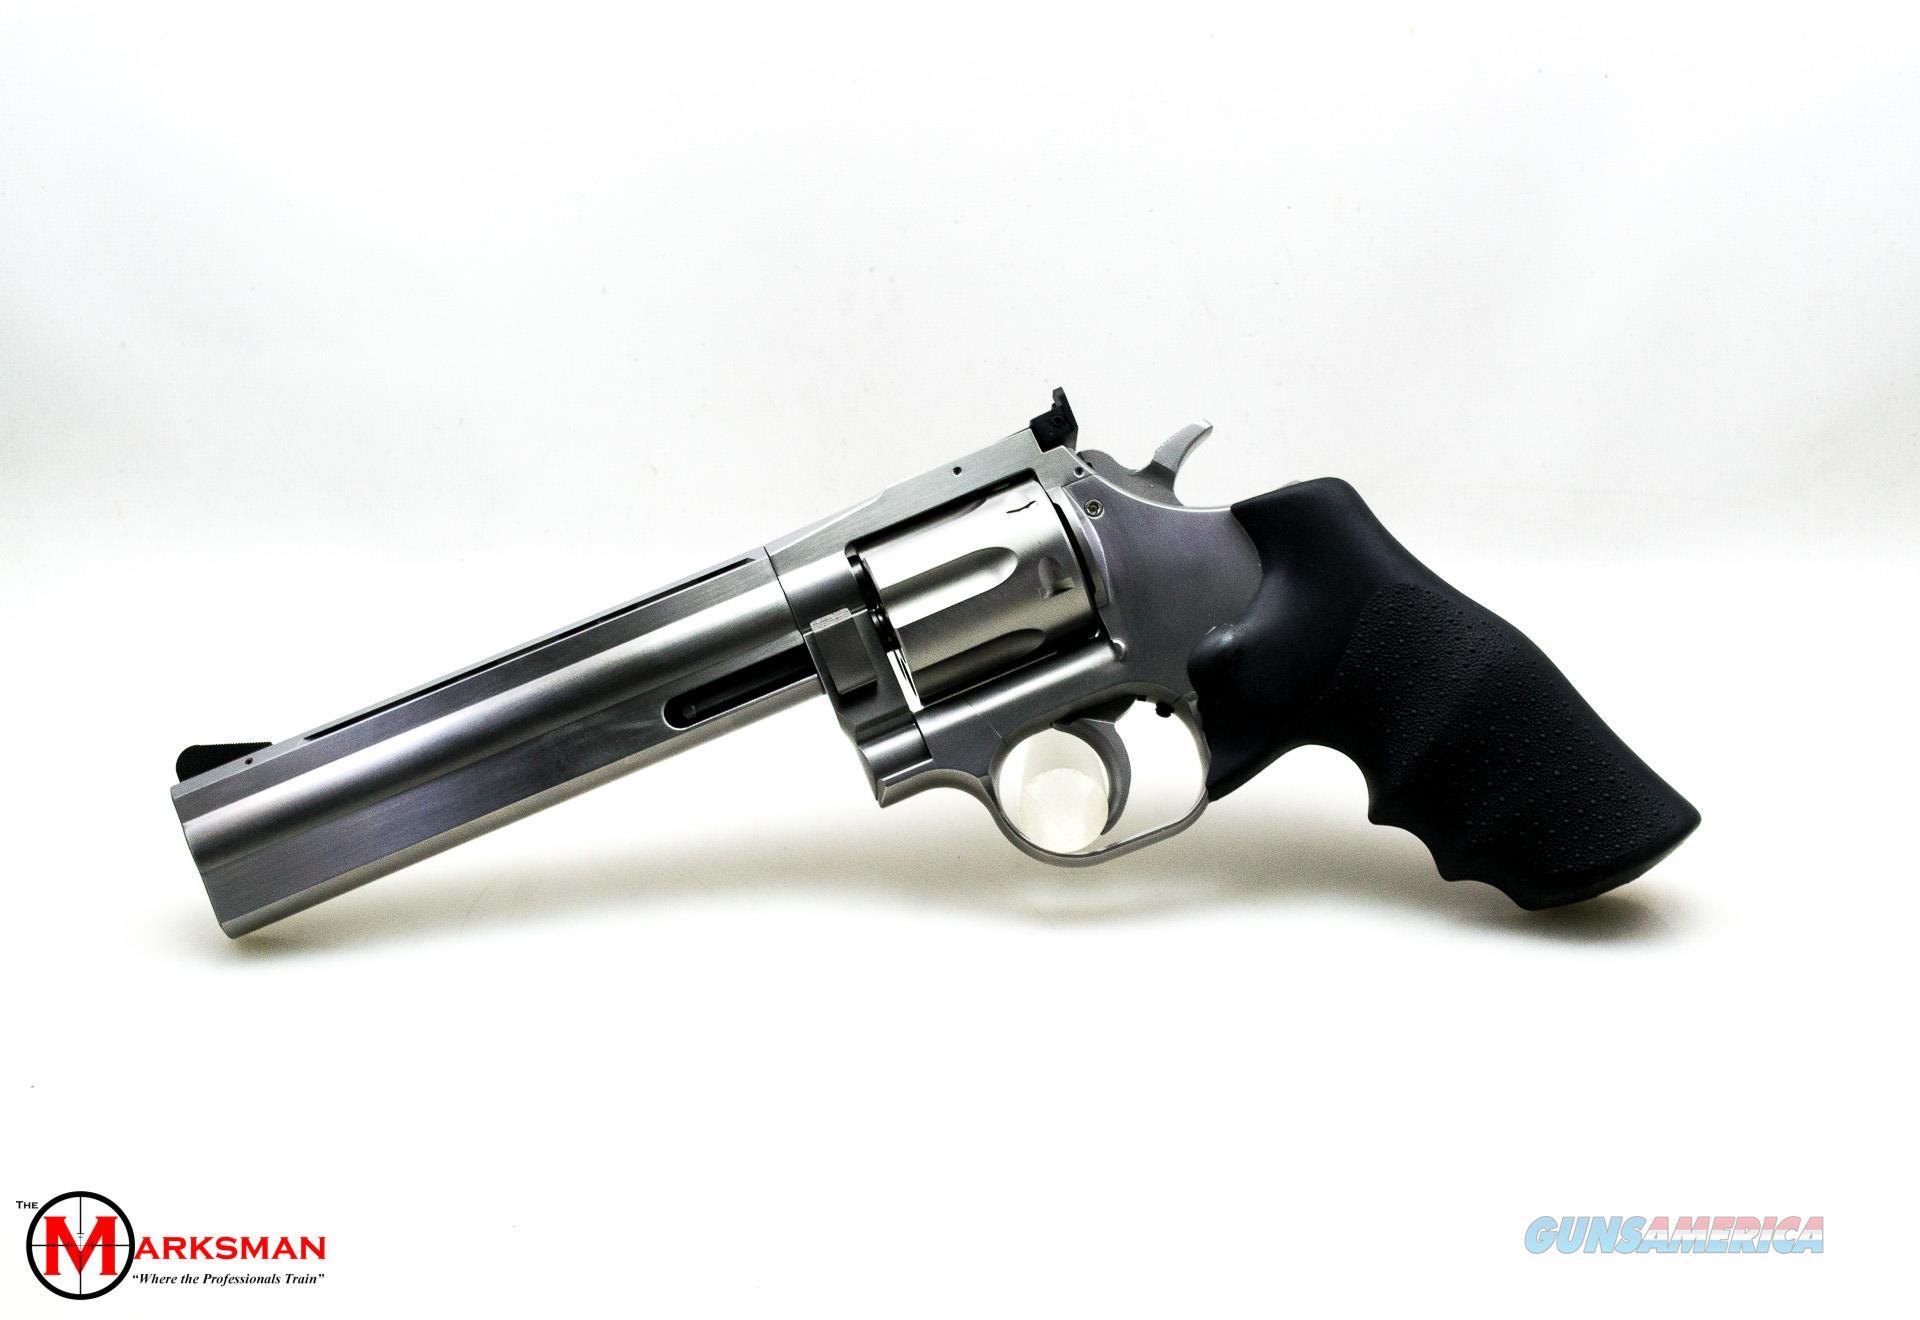 Dan Wesson 715, .357 Magnum, Blemished NEW  Guns > Pistols > Dan Wesson Pistols/Revolvers > Revolvers